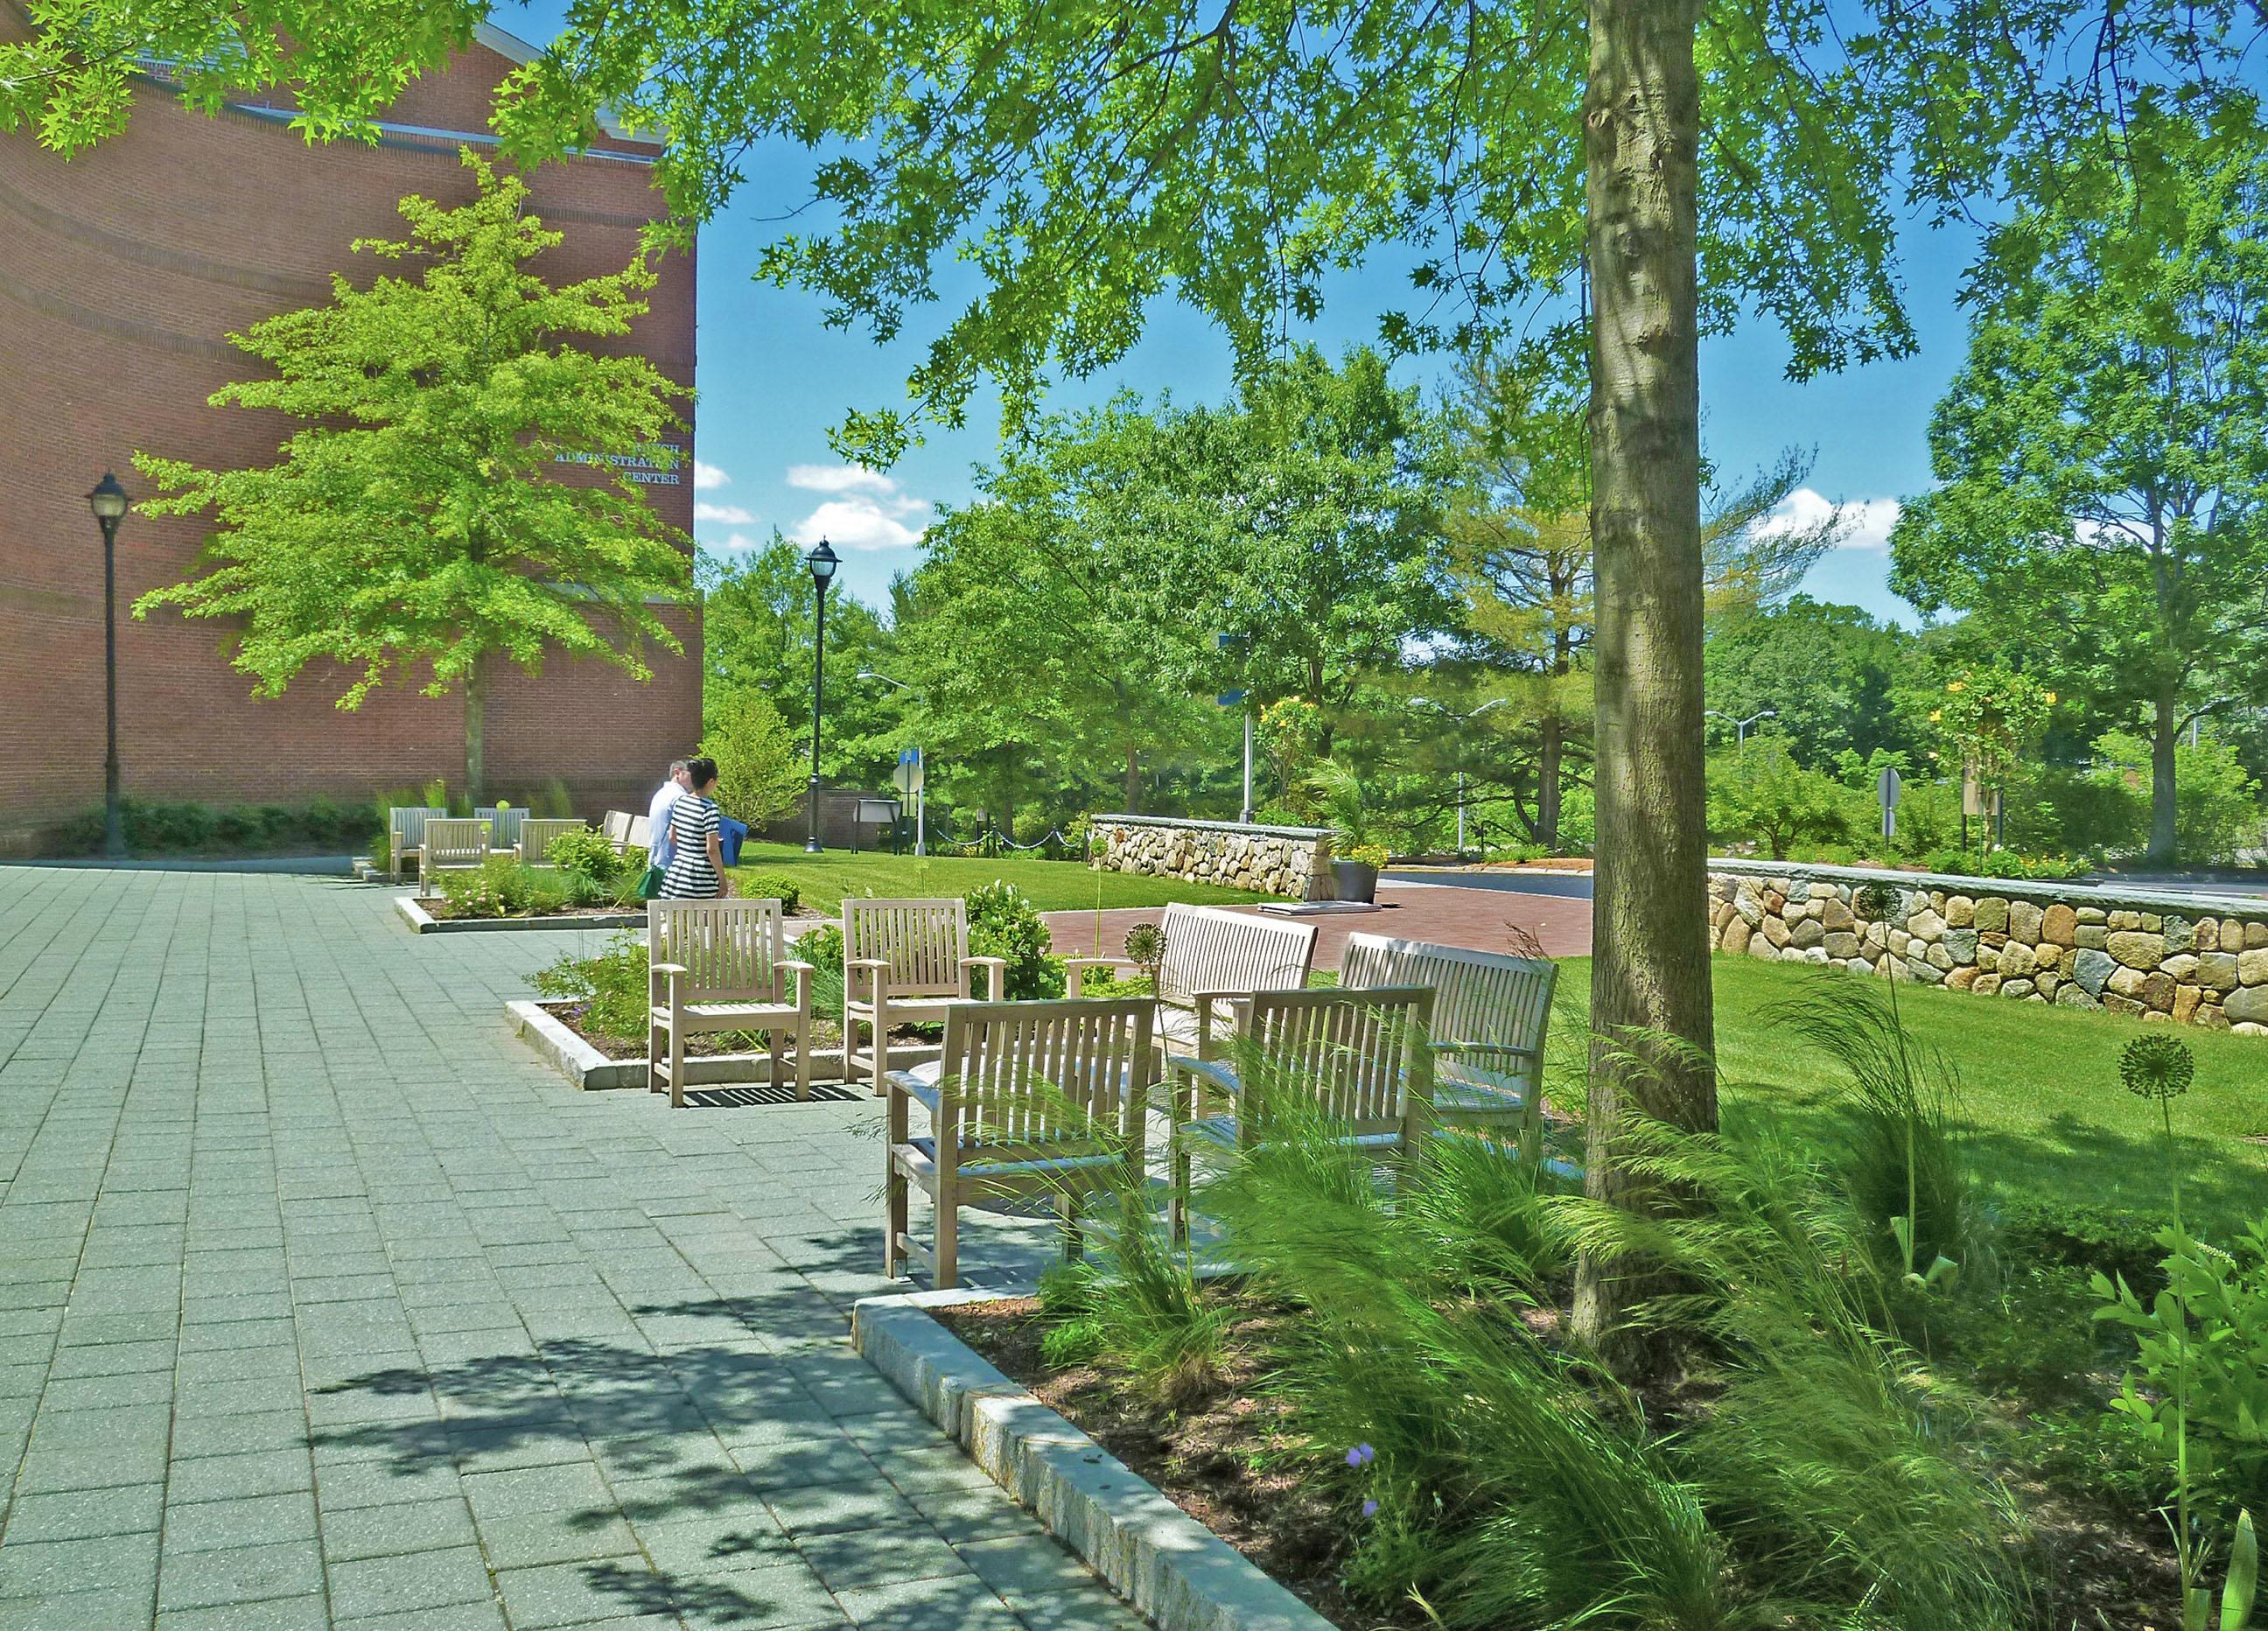 Bentley University Campus Entry Plaza